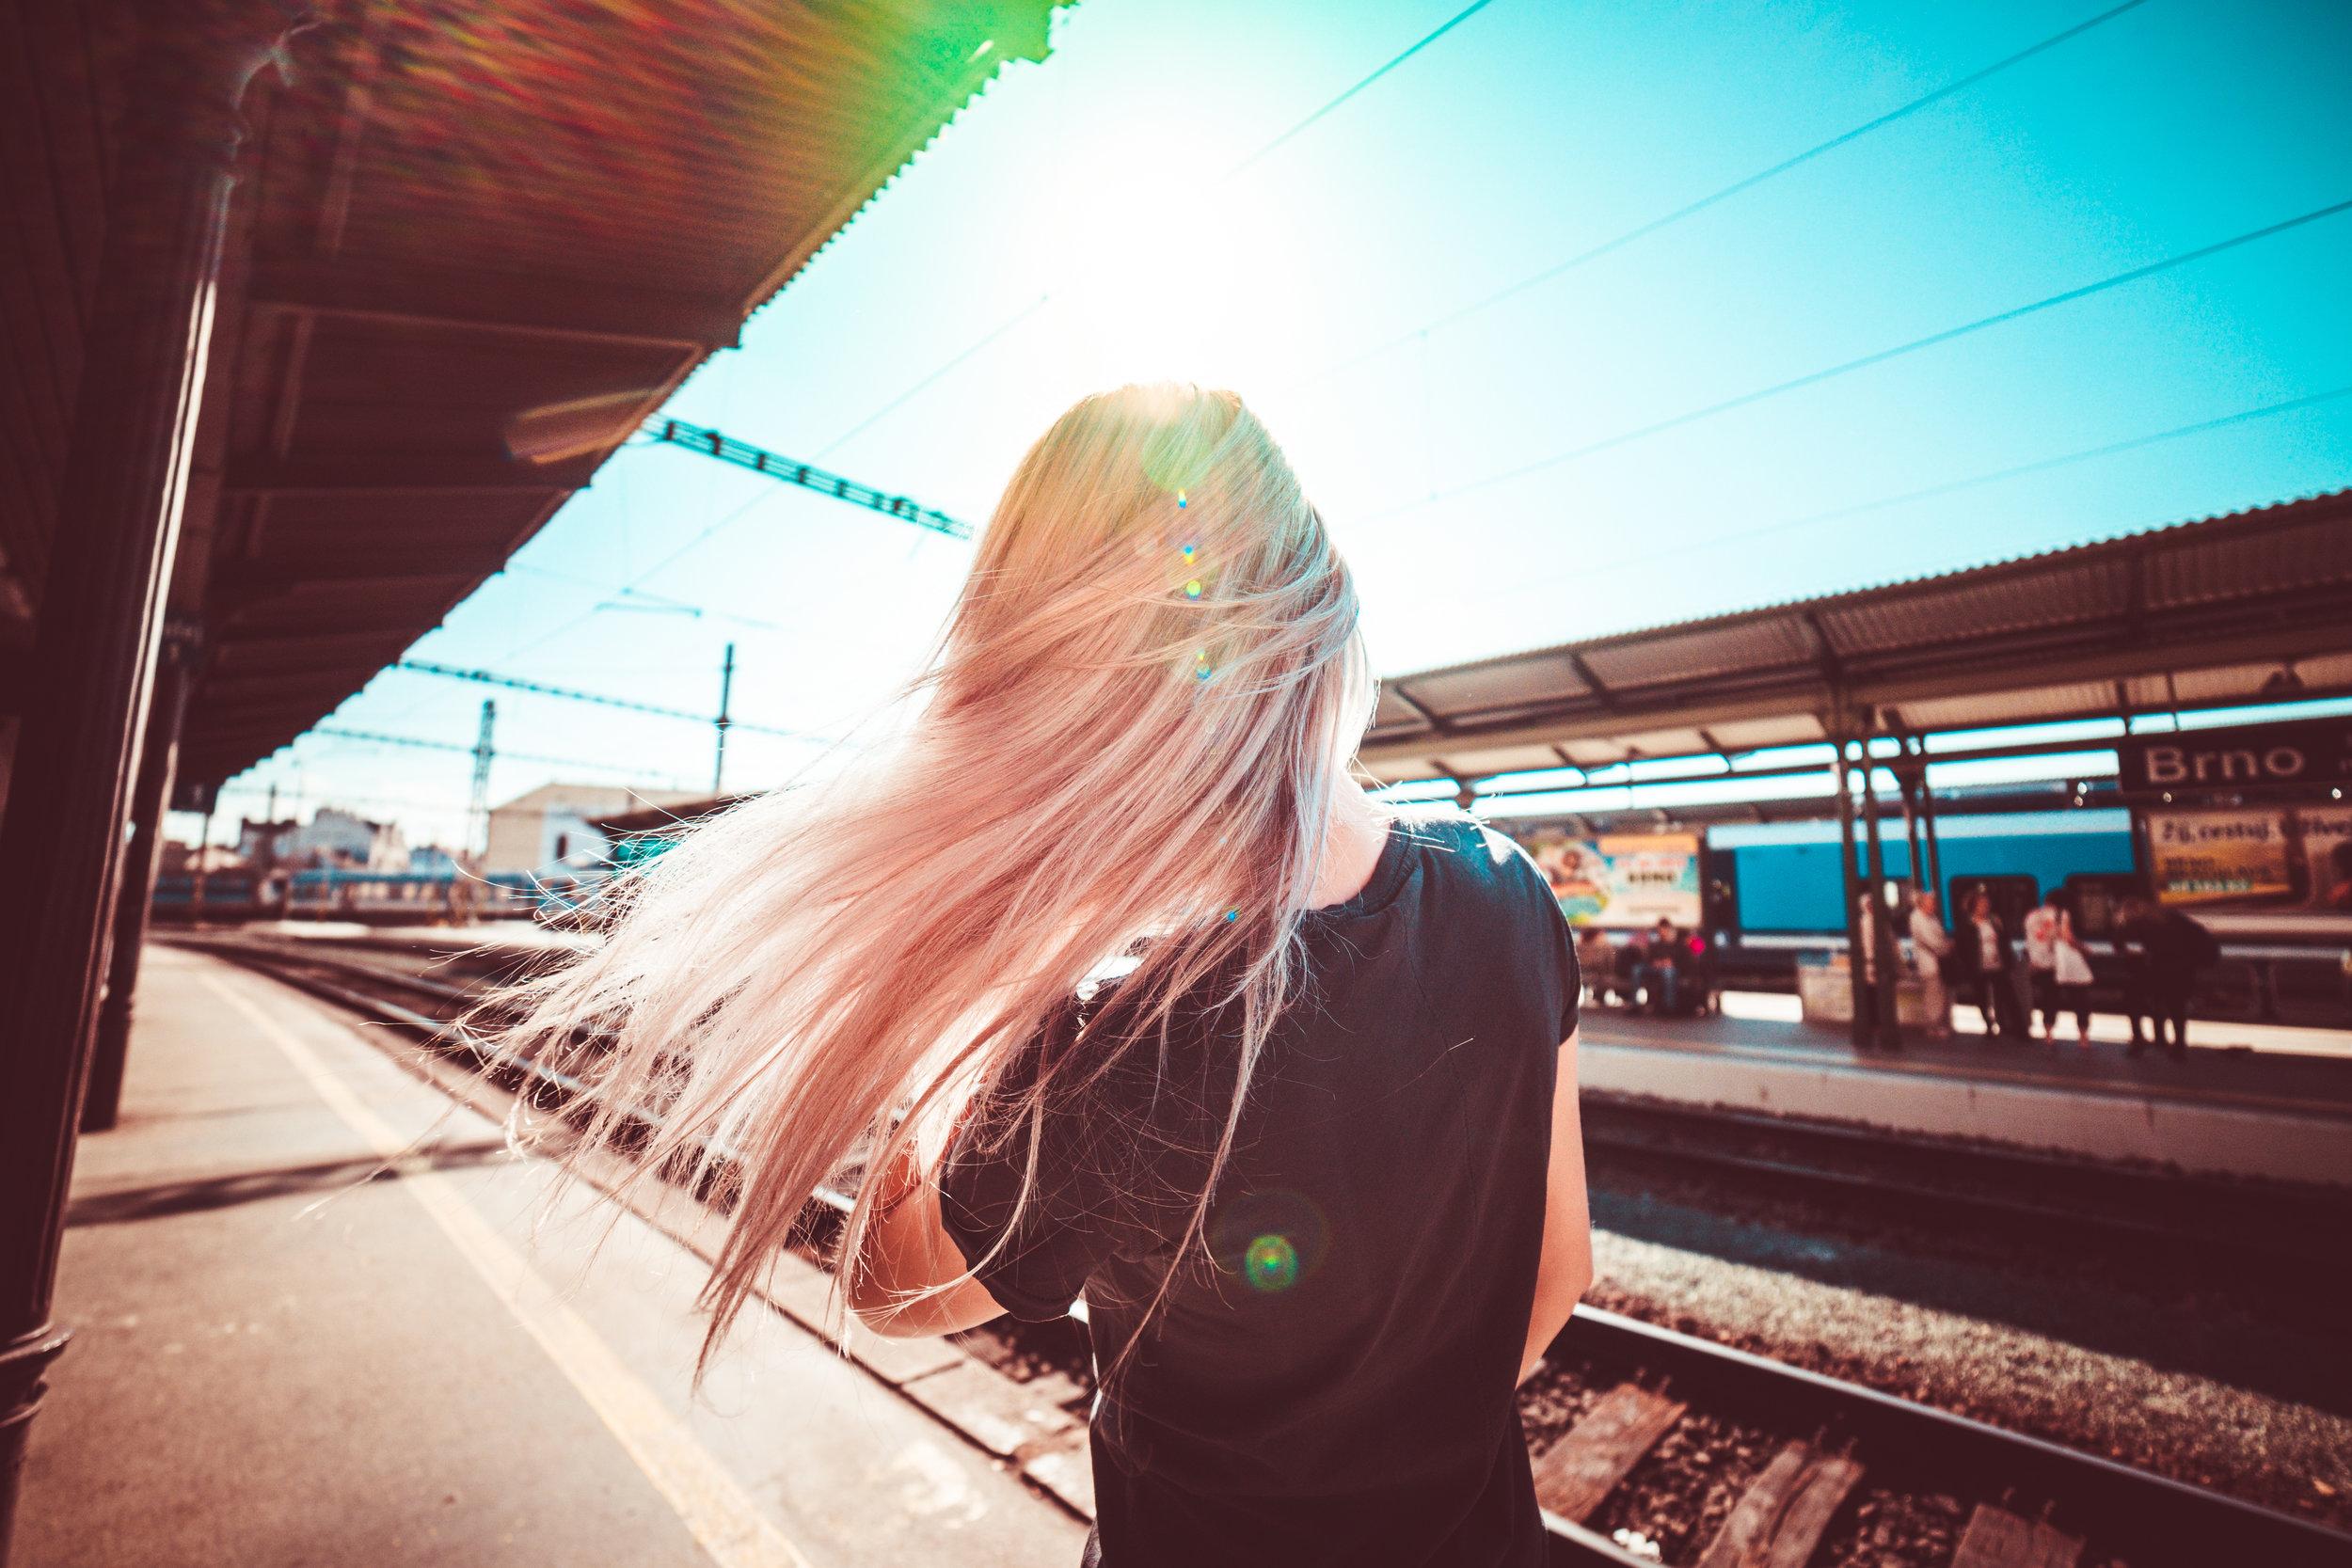 happy-girl-enjoying-free-time-waiting-for-train-picjumbo-com.jpg